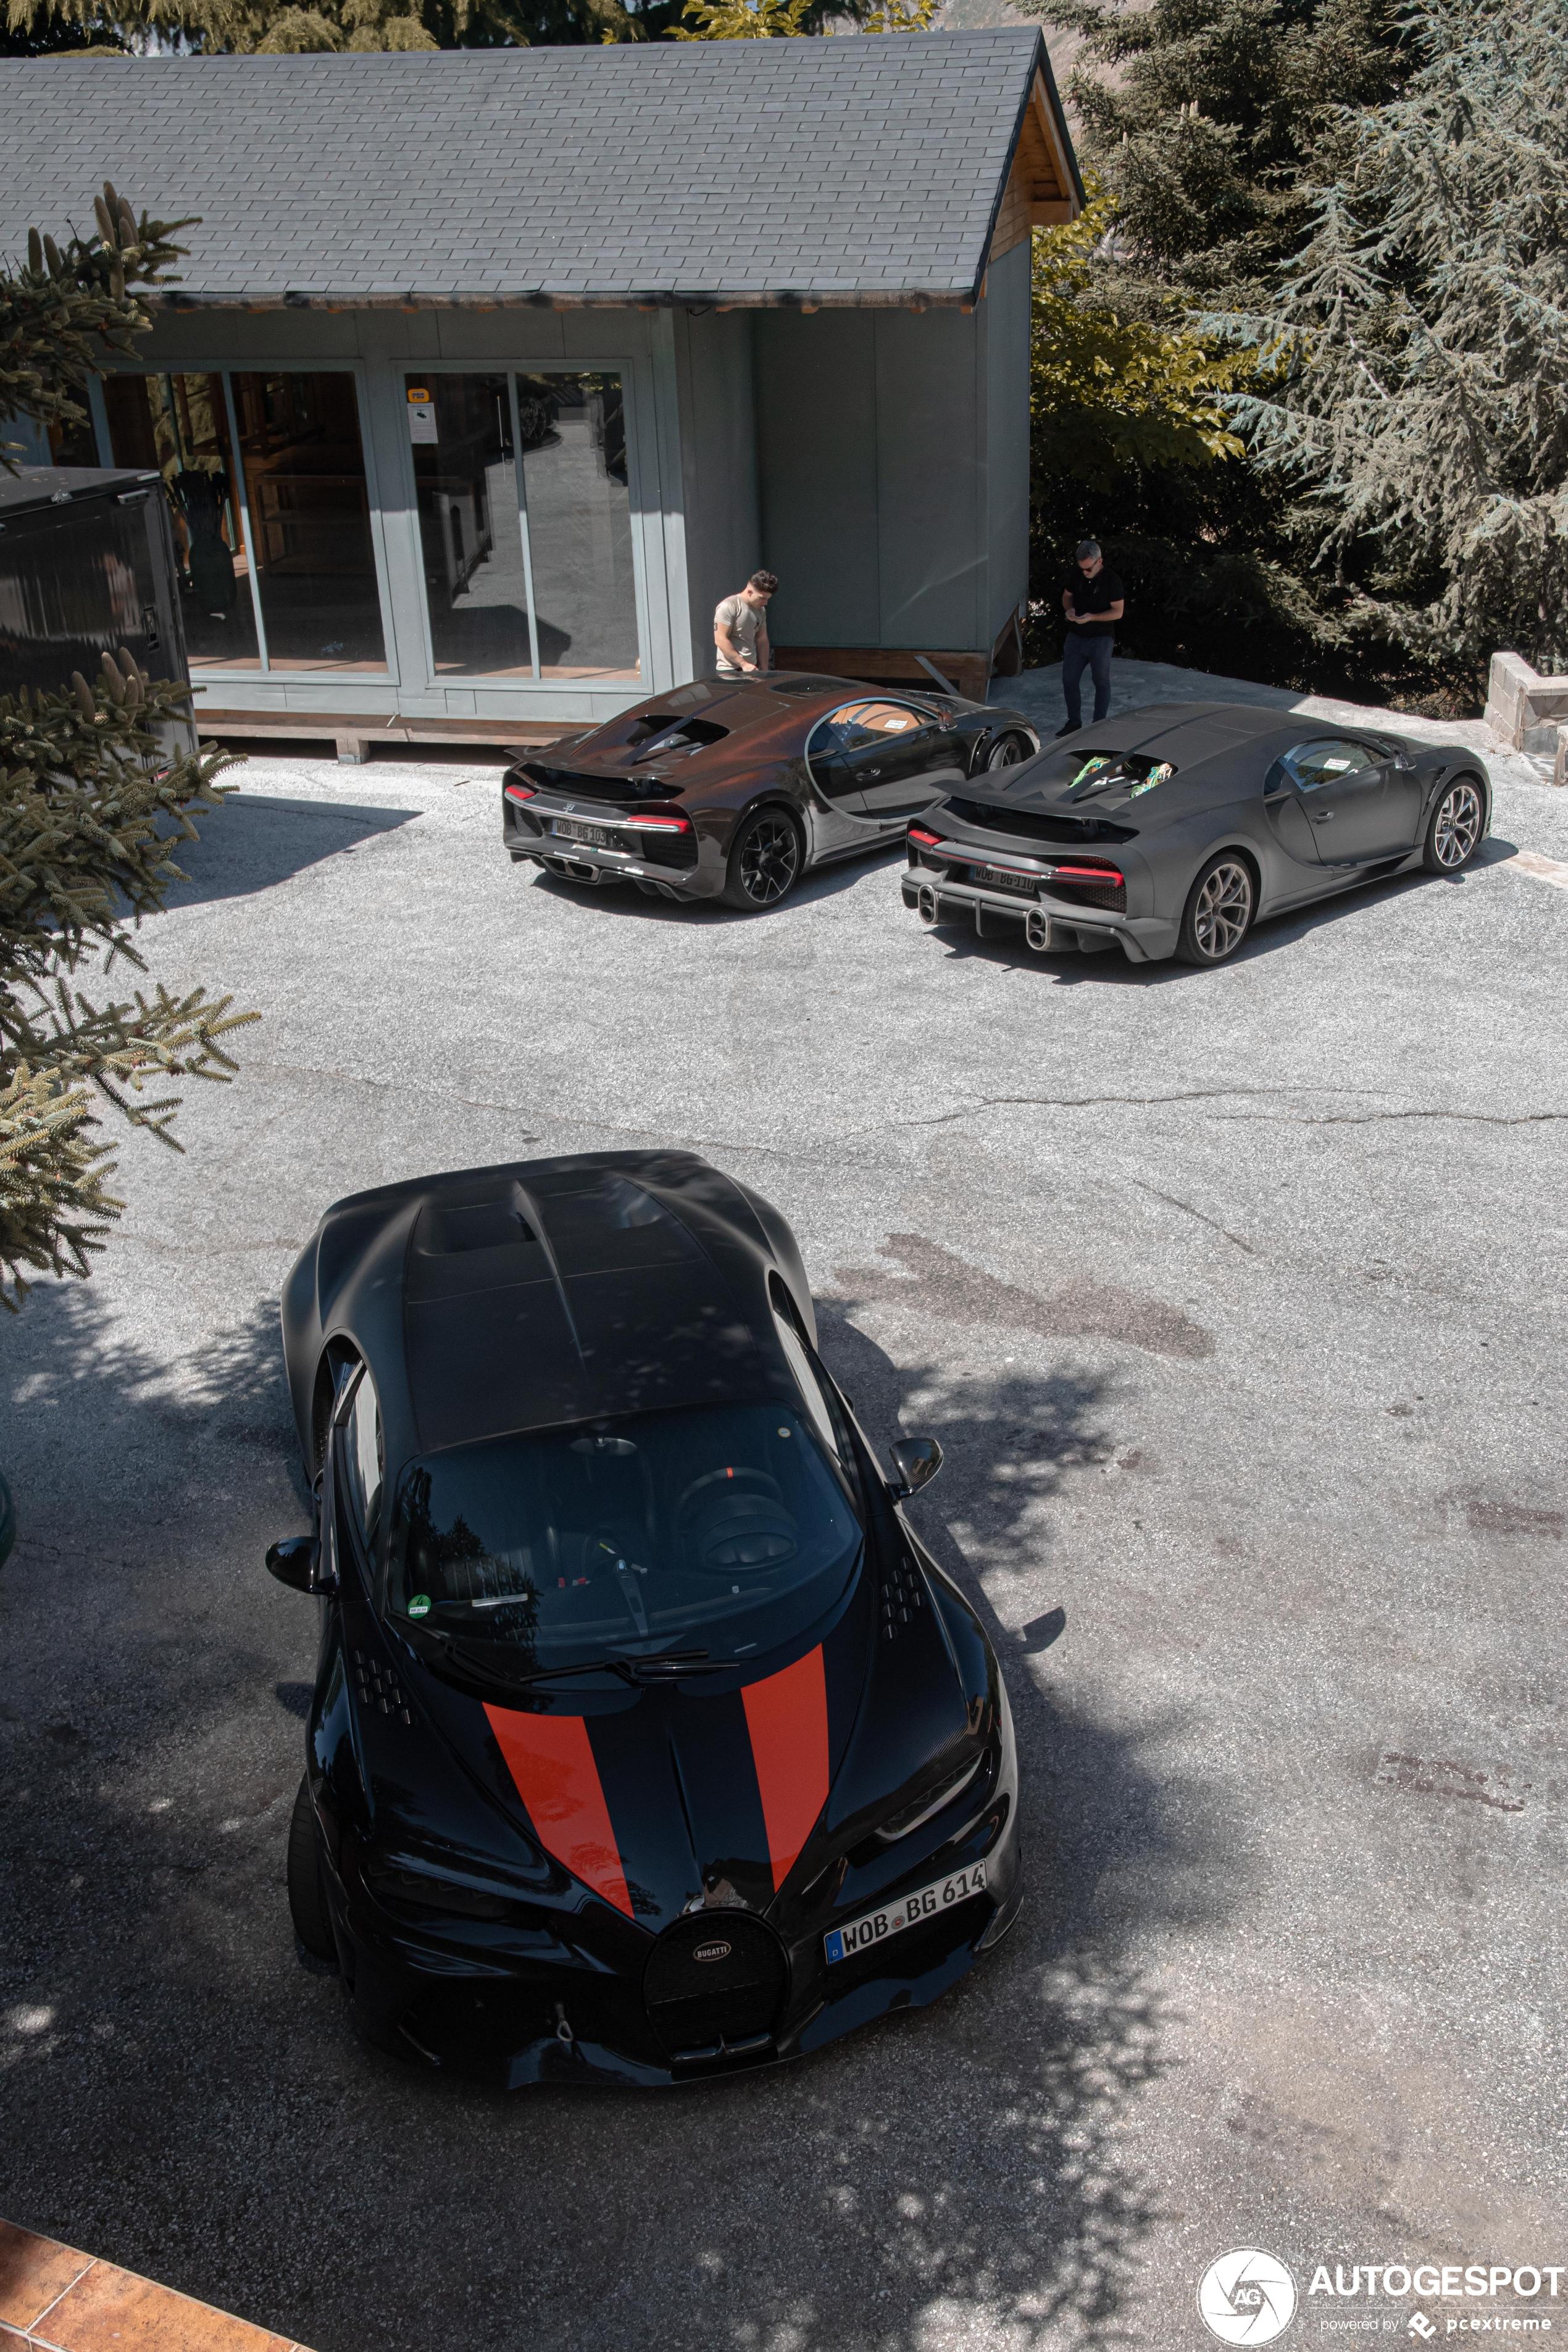 Bugatti trio turns up in Spain